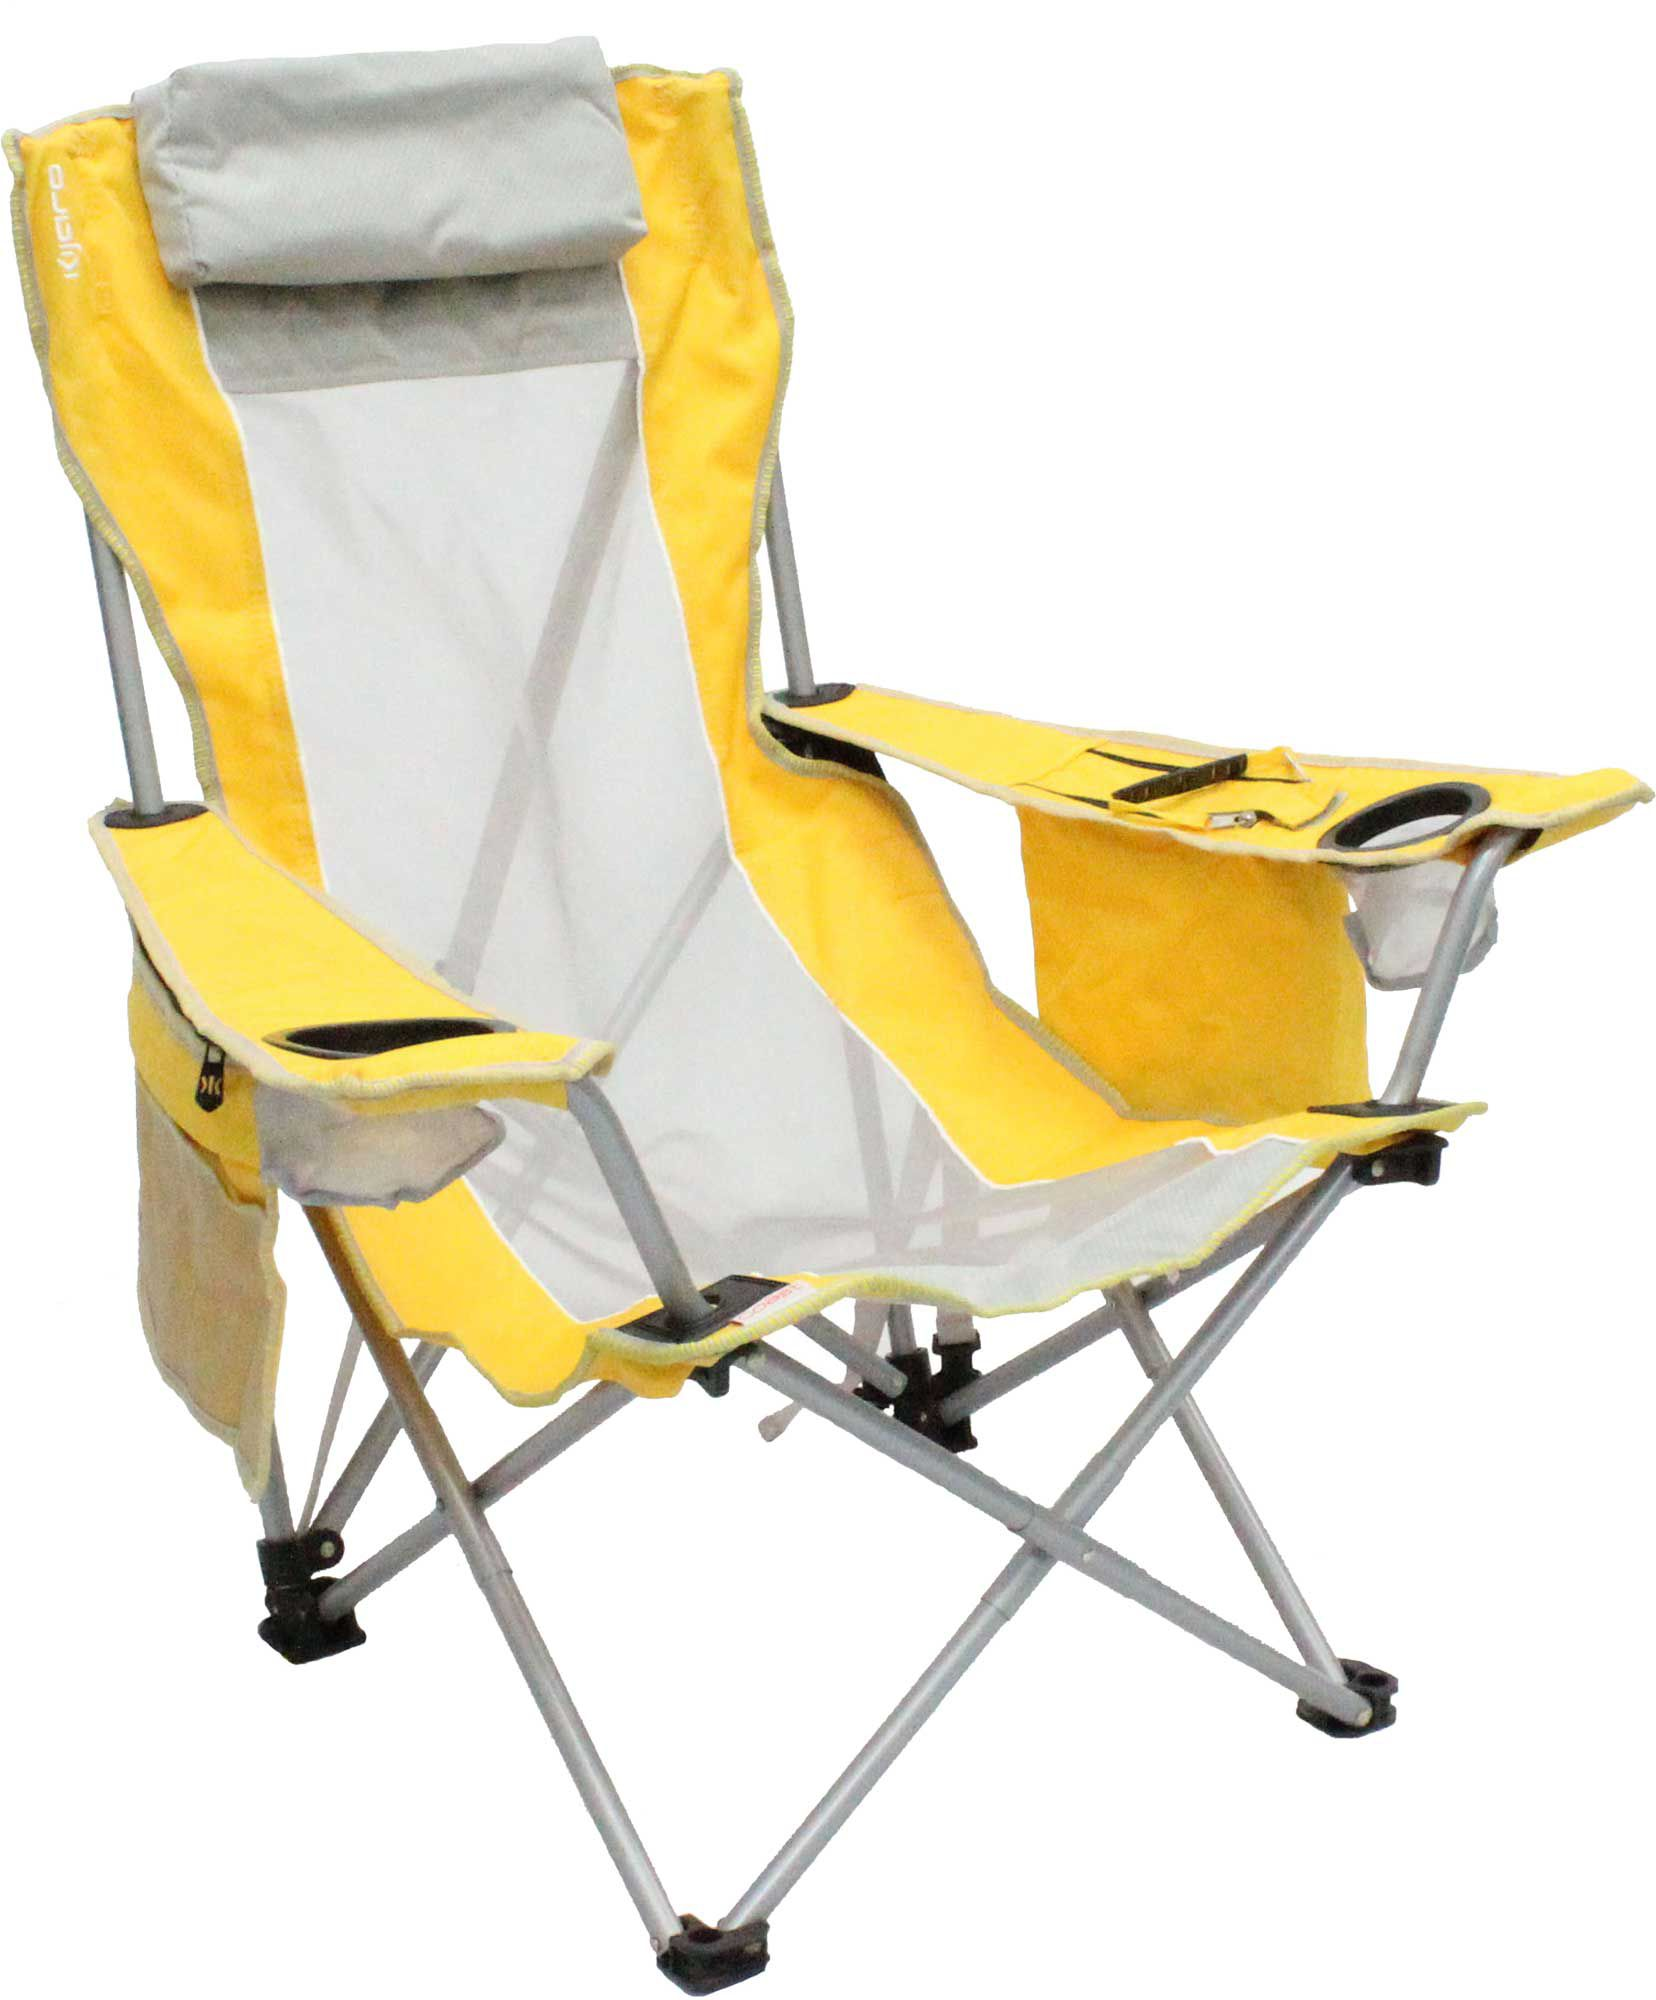 Merveilleux Kijaro Beach Sling Chair